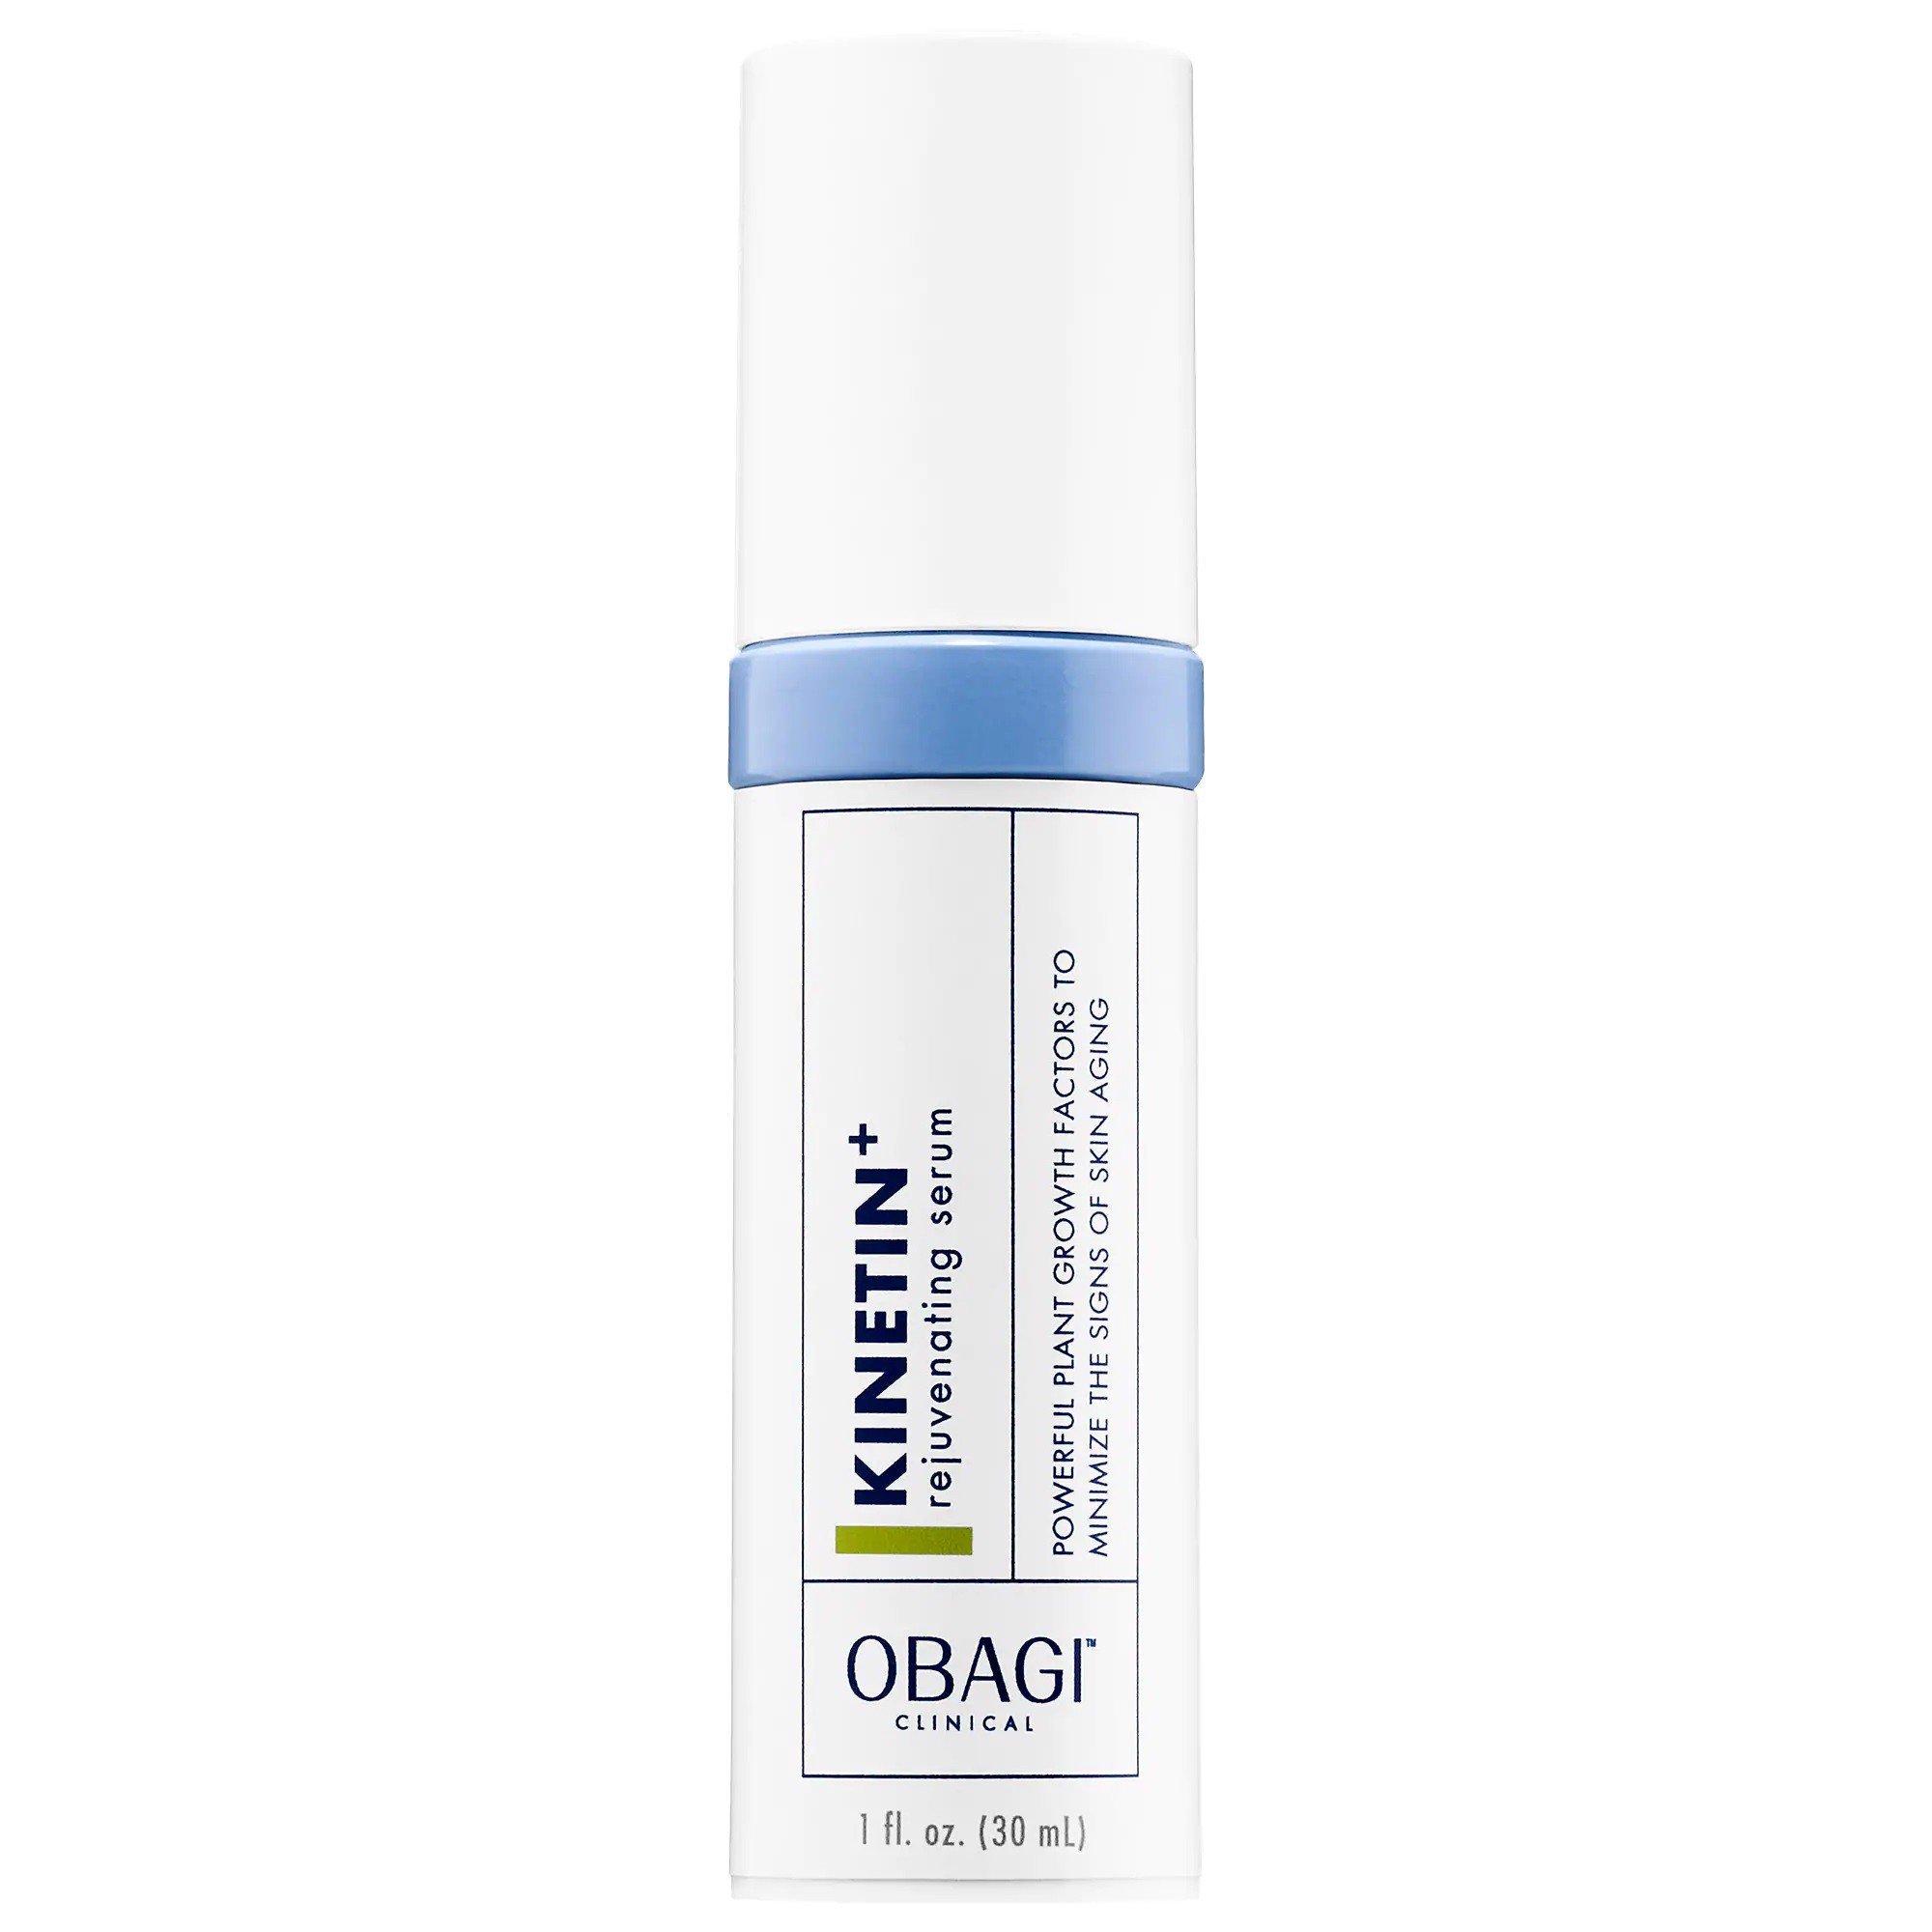 serum-phuc-hoi-da-ton-thuong-obagi-clinical-kinetin-rejuvenating-serum-30ml